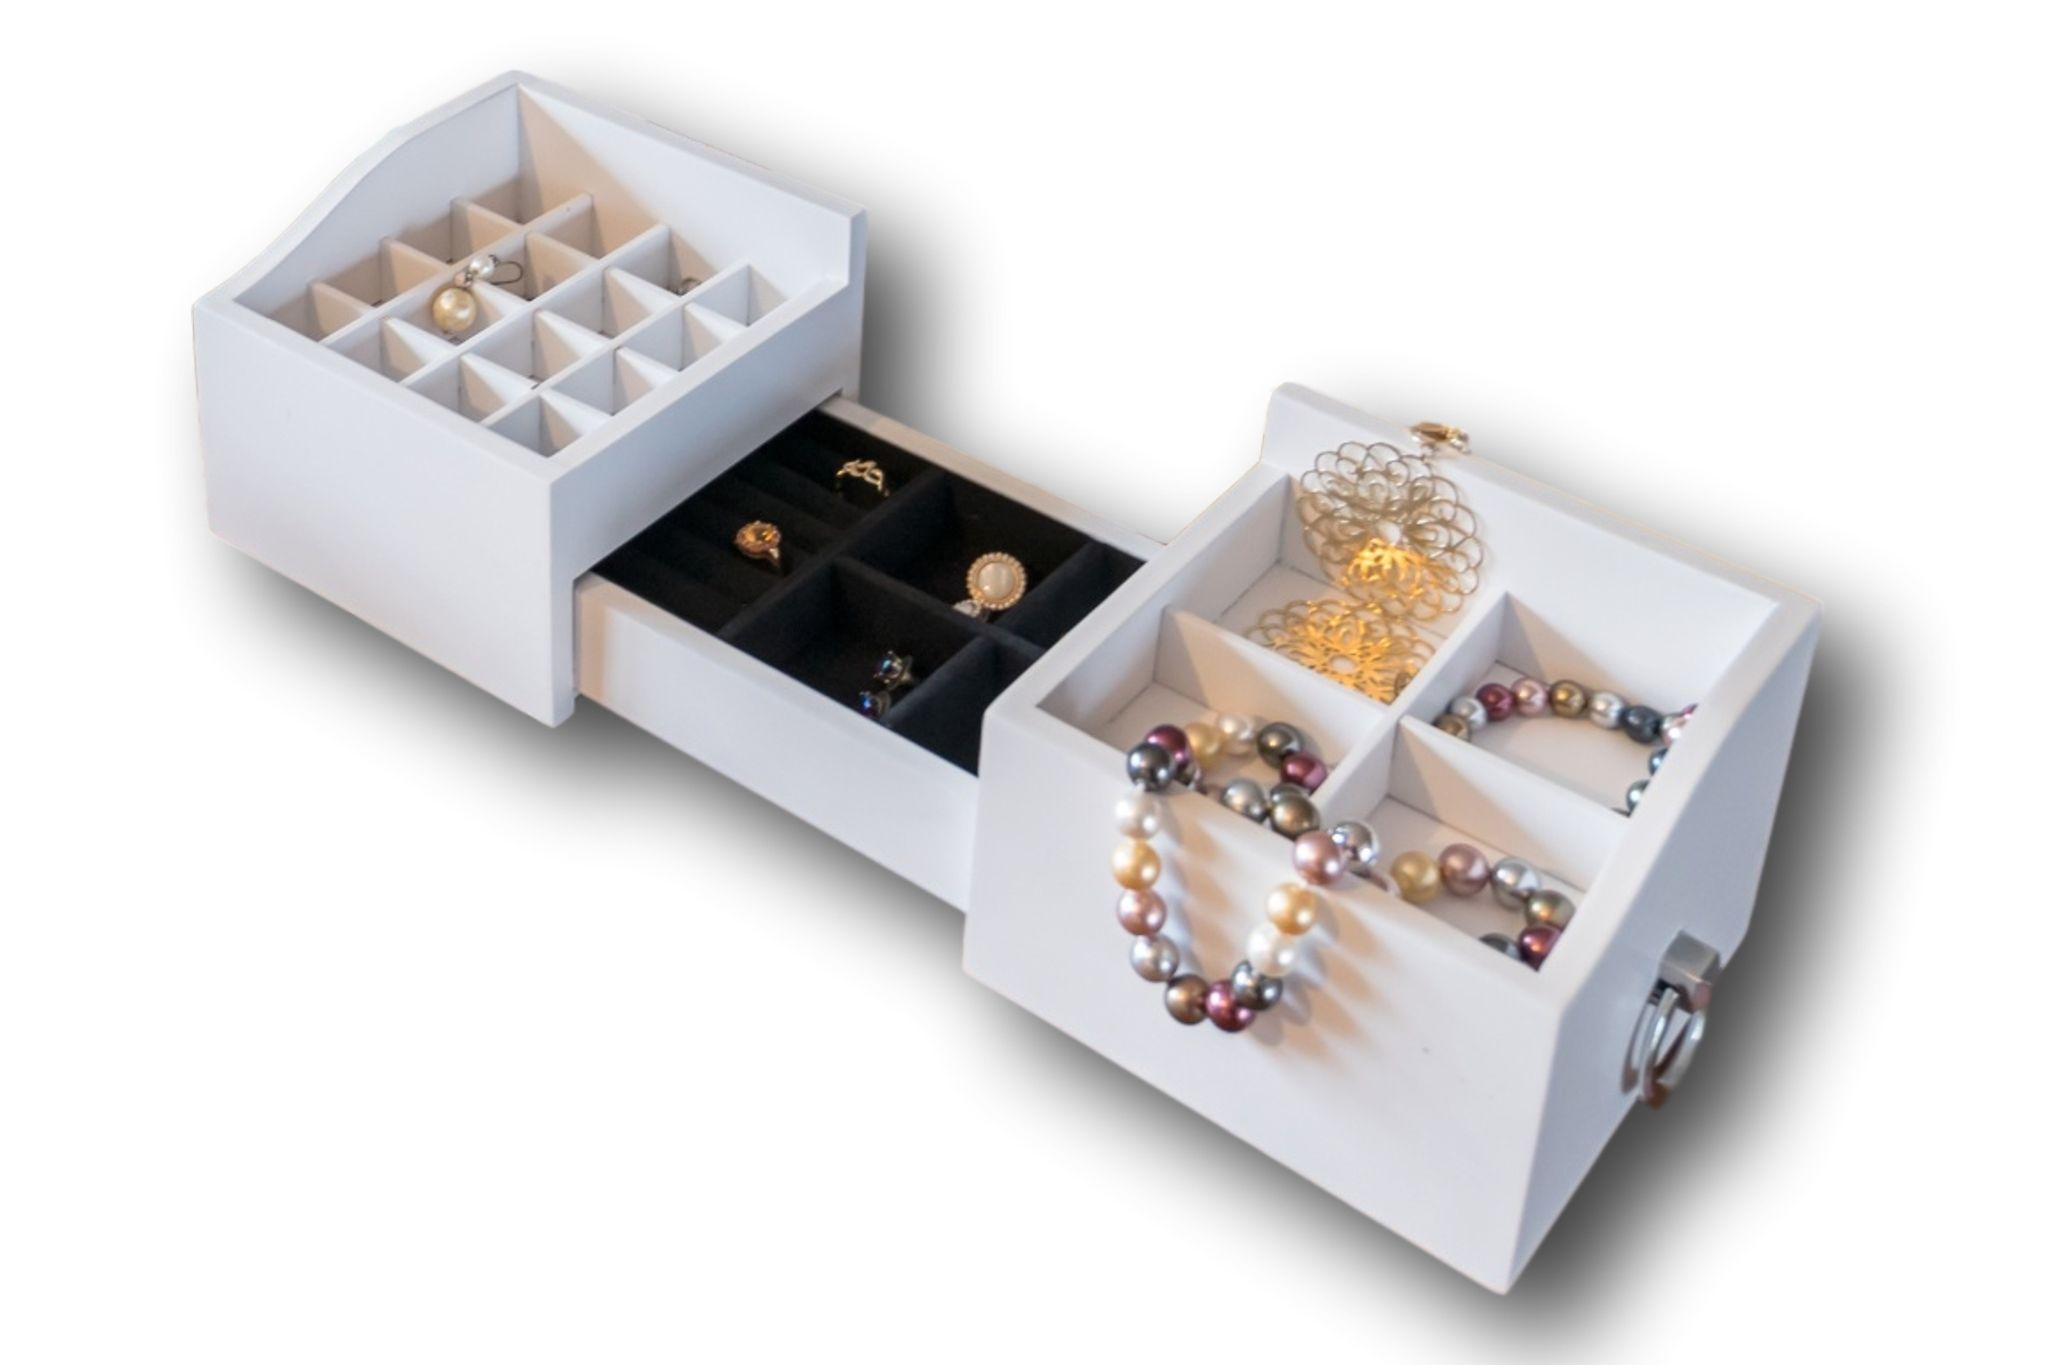 schminkkasten lippenstift g nstige landhausm bel online. Black Bedroom Furniture Sets. Home Design Ideas